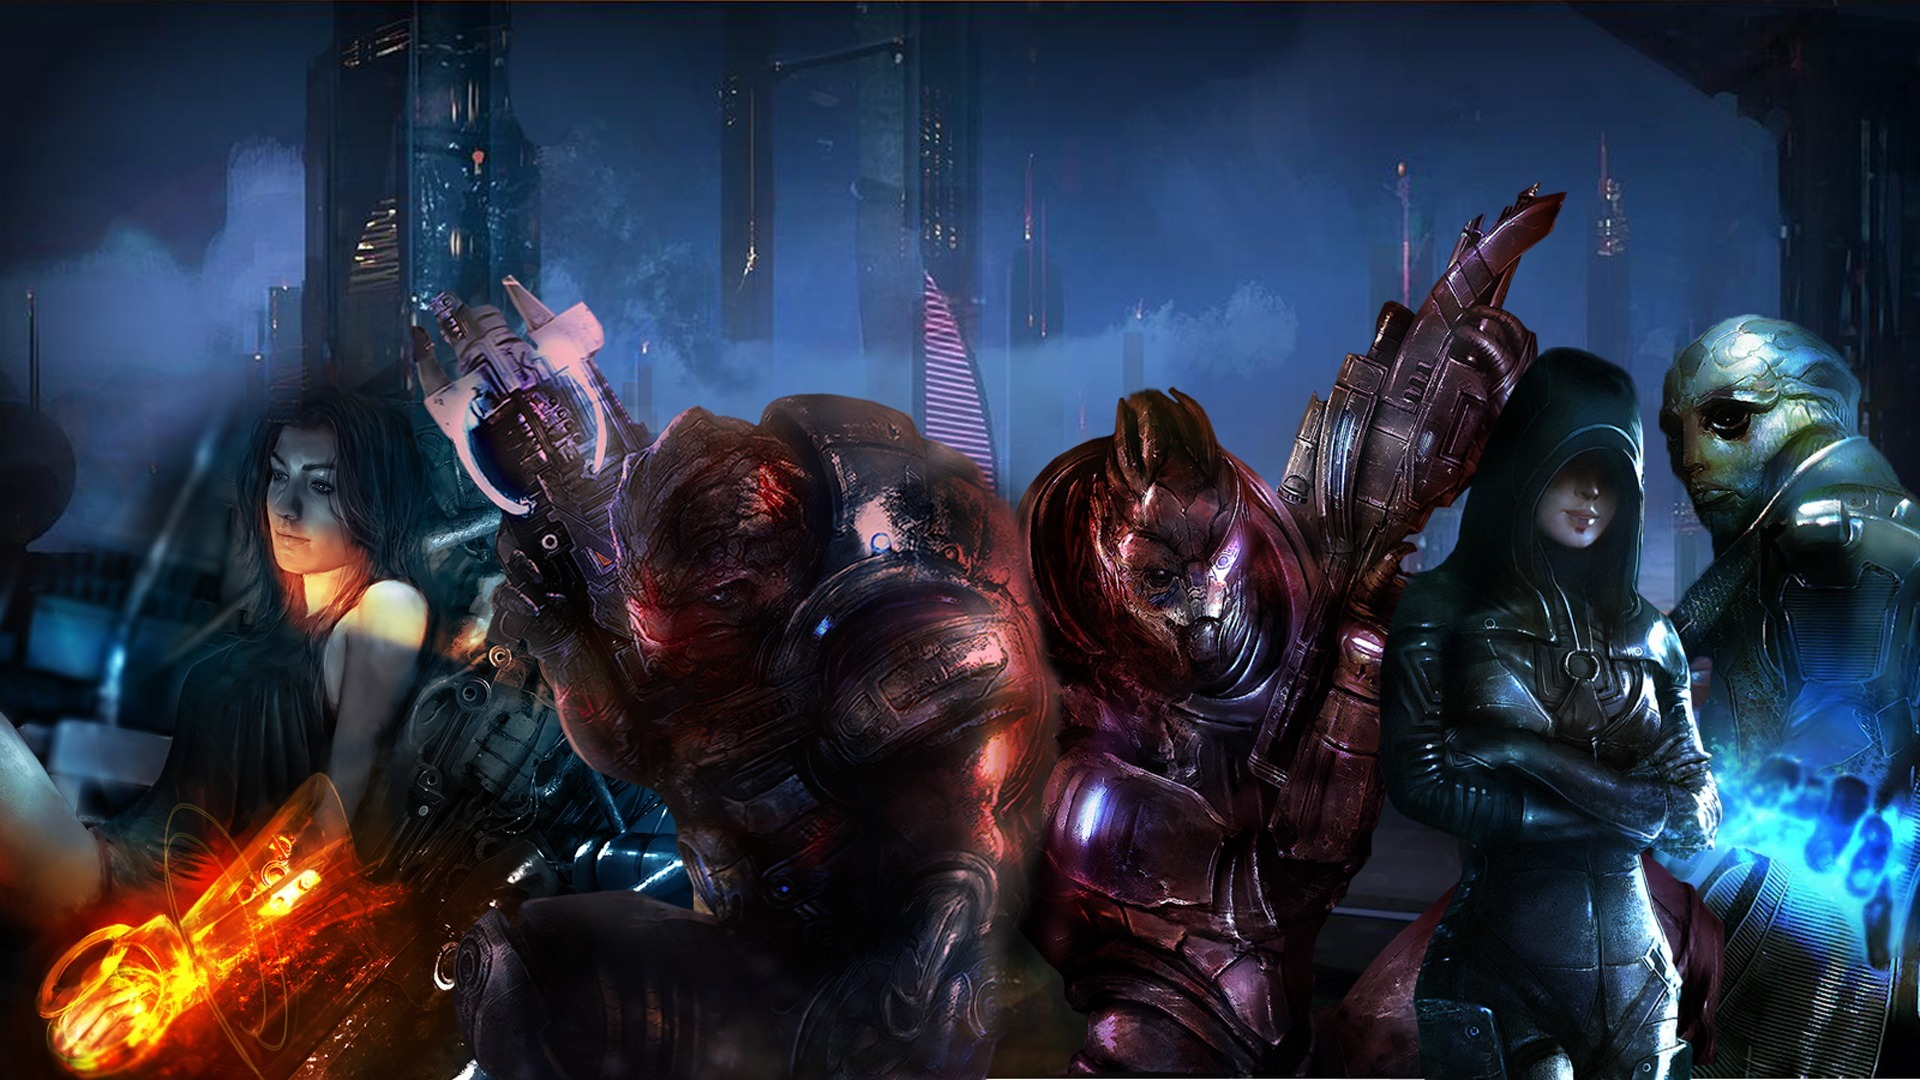 Mass Effect 3 Hd Wallpaper Background Image 1920x1080 Id